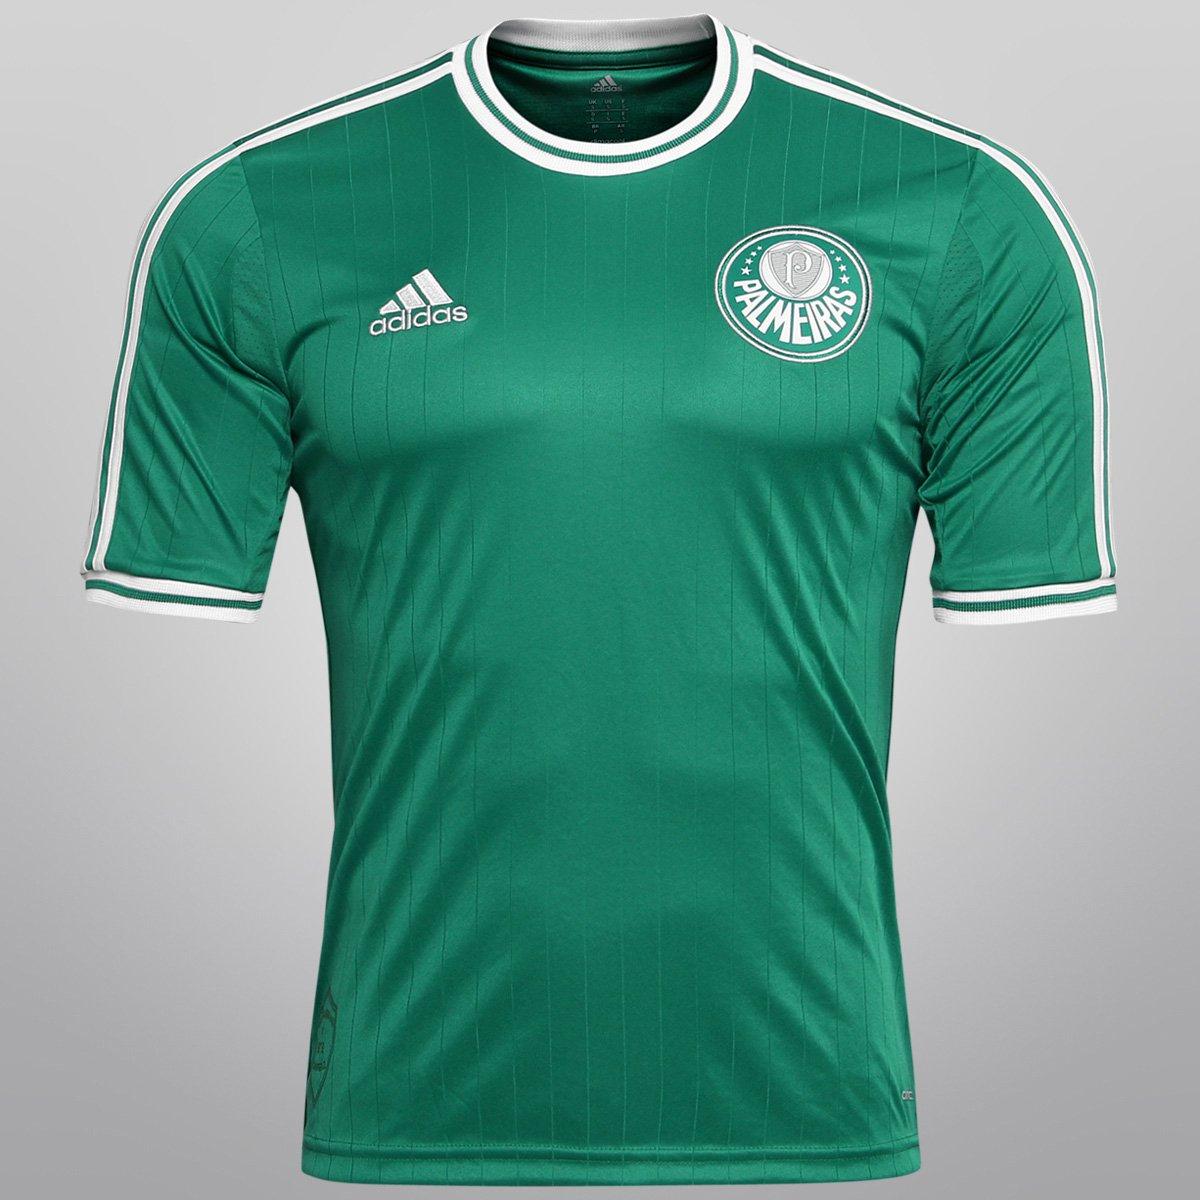 Camisa Adidas Palmeiras I 13 14 s nº - Compre Agora  0b8bbba6926e0